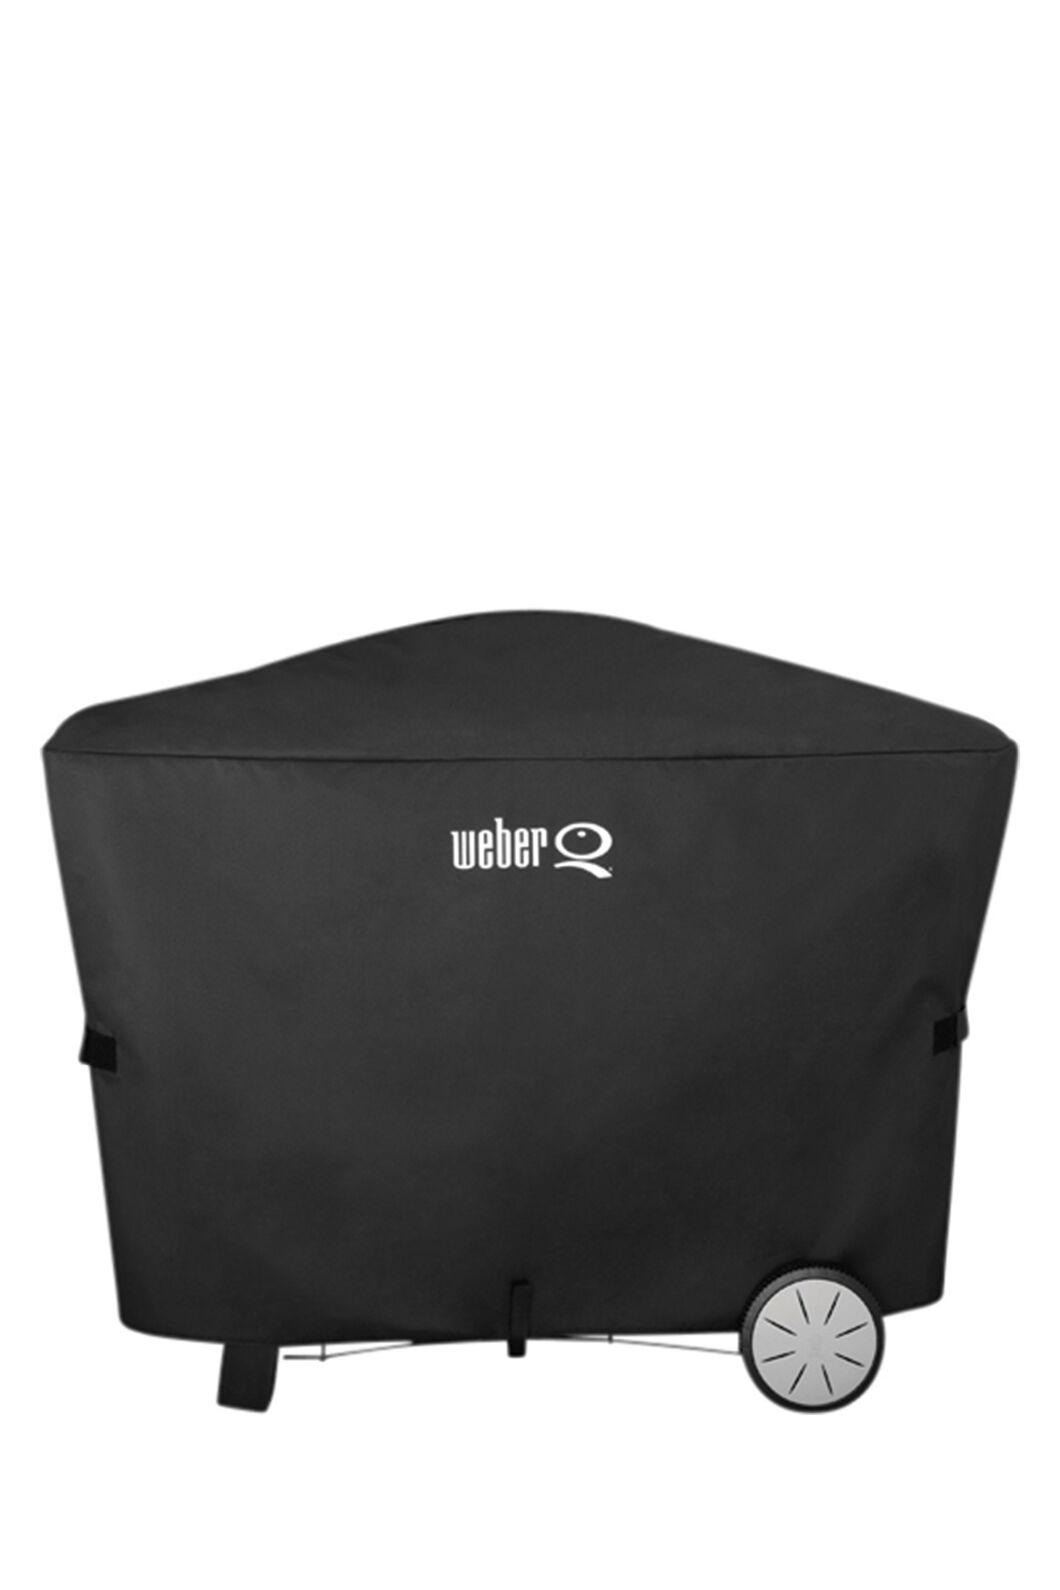 Weber Family Q/Q Premium BBQ Cover, None, hi-res